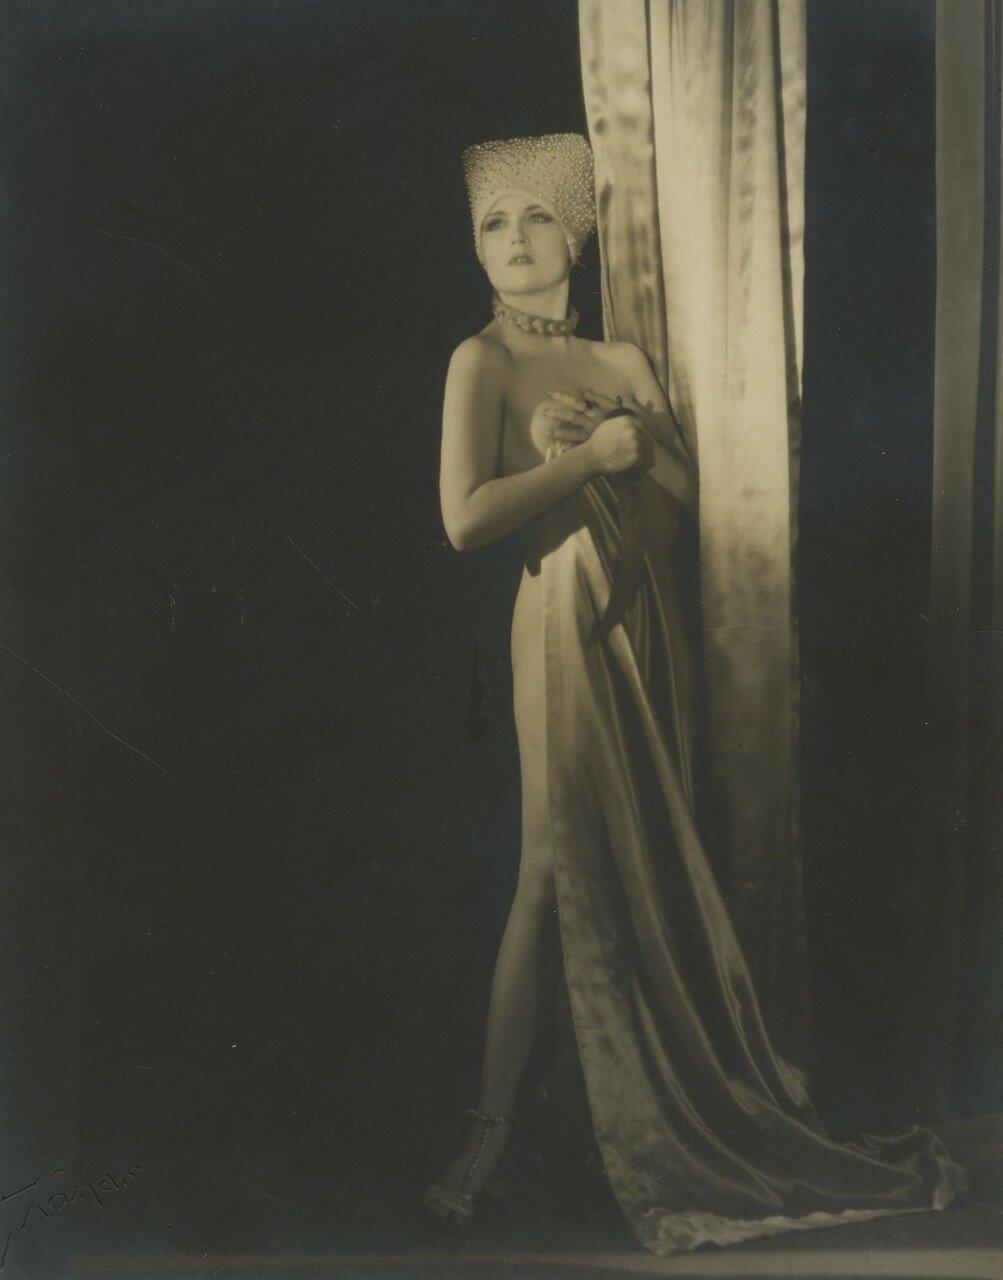 Carole Lombard. 1929